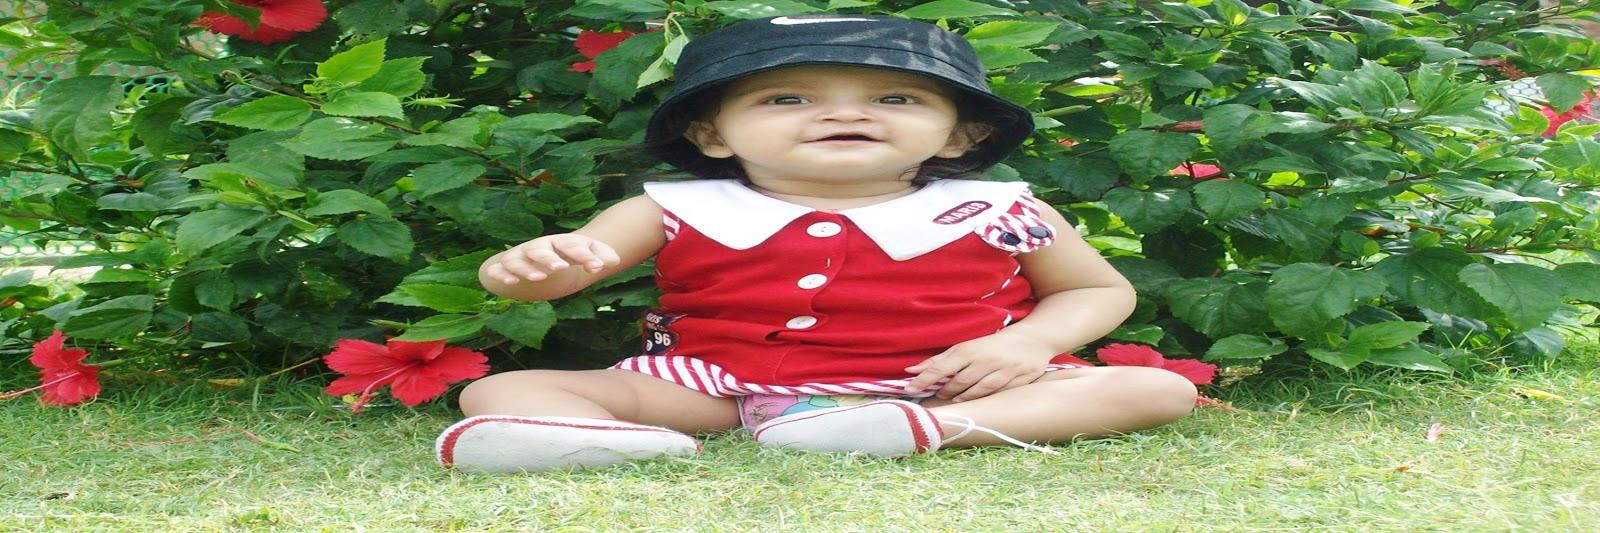 Girl Baby Names Start With N Letter - Good Baby Names| Elite